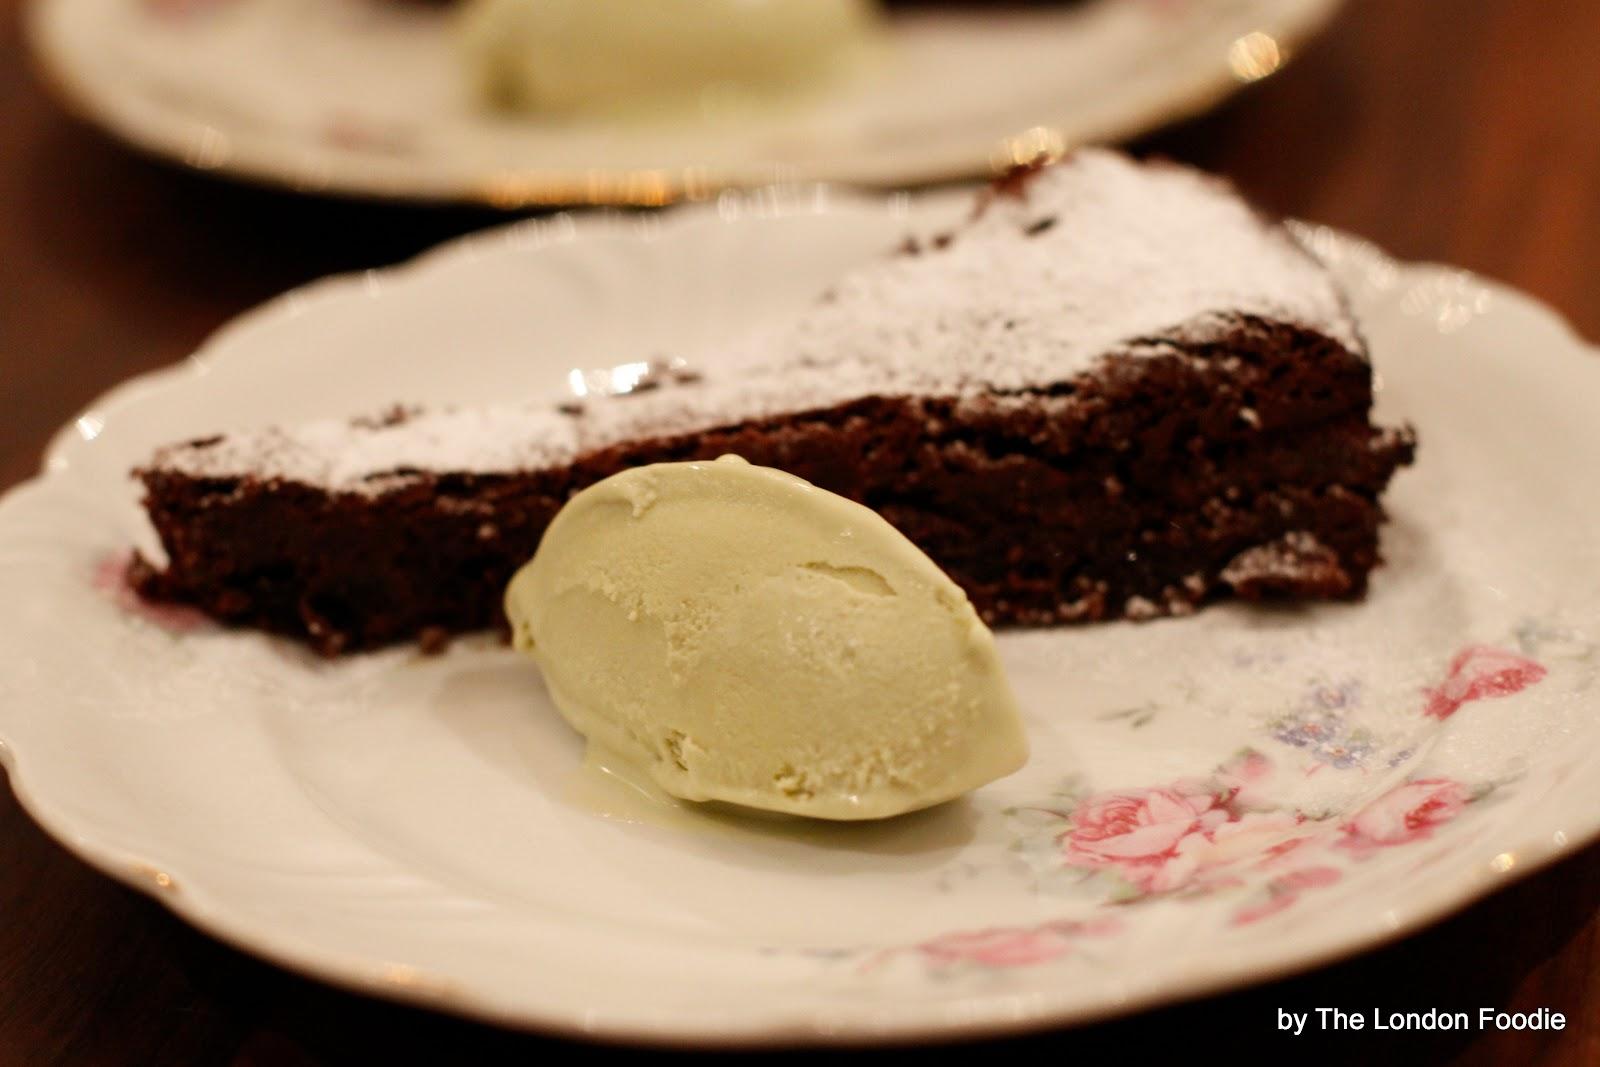 The London Foodie: Flourless Dark Chocolate Cake with Whisky Prunes ...